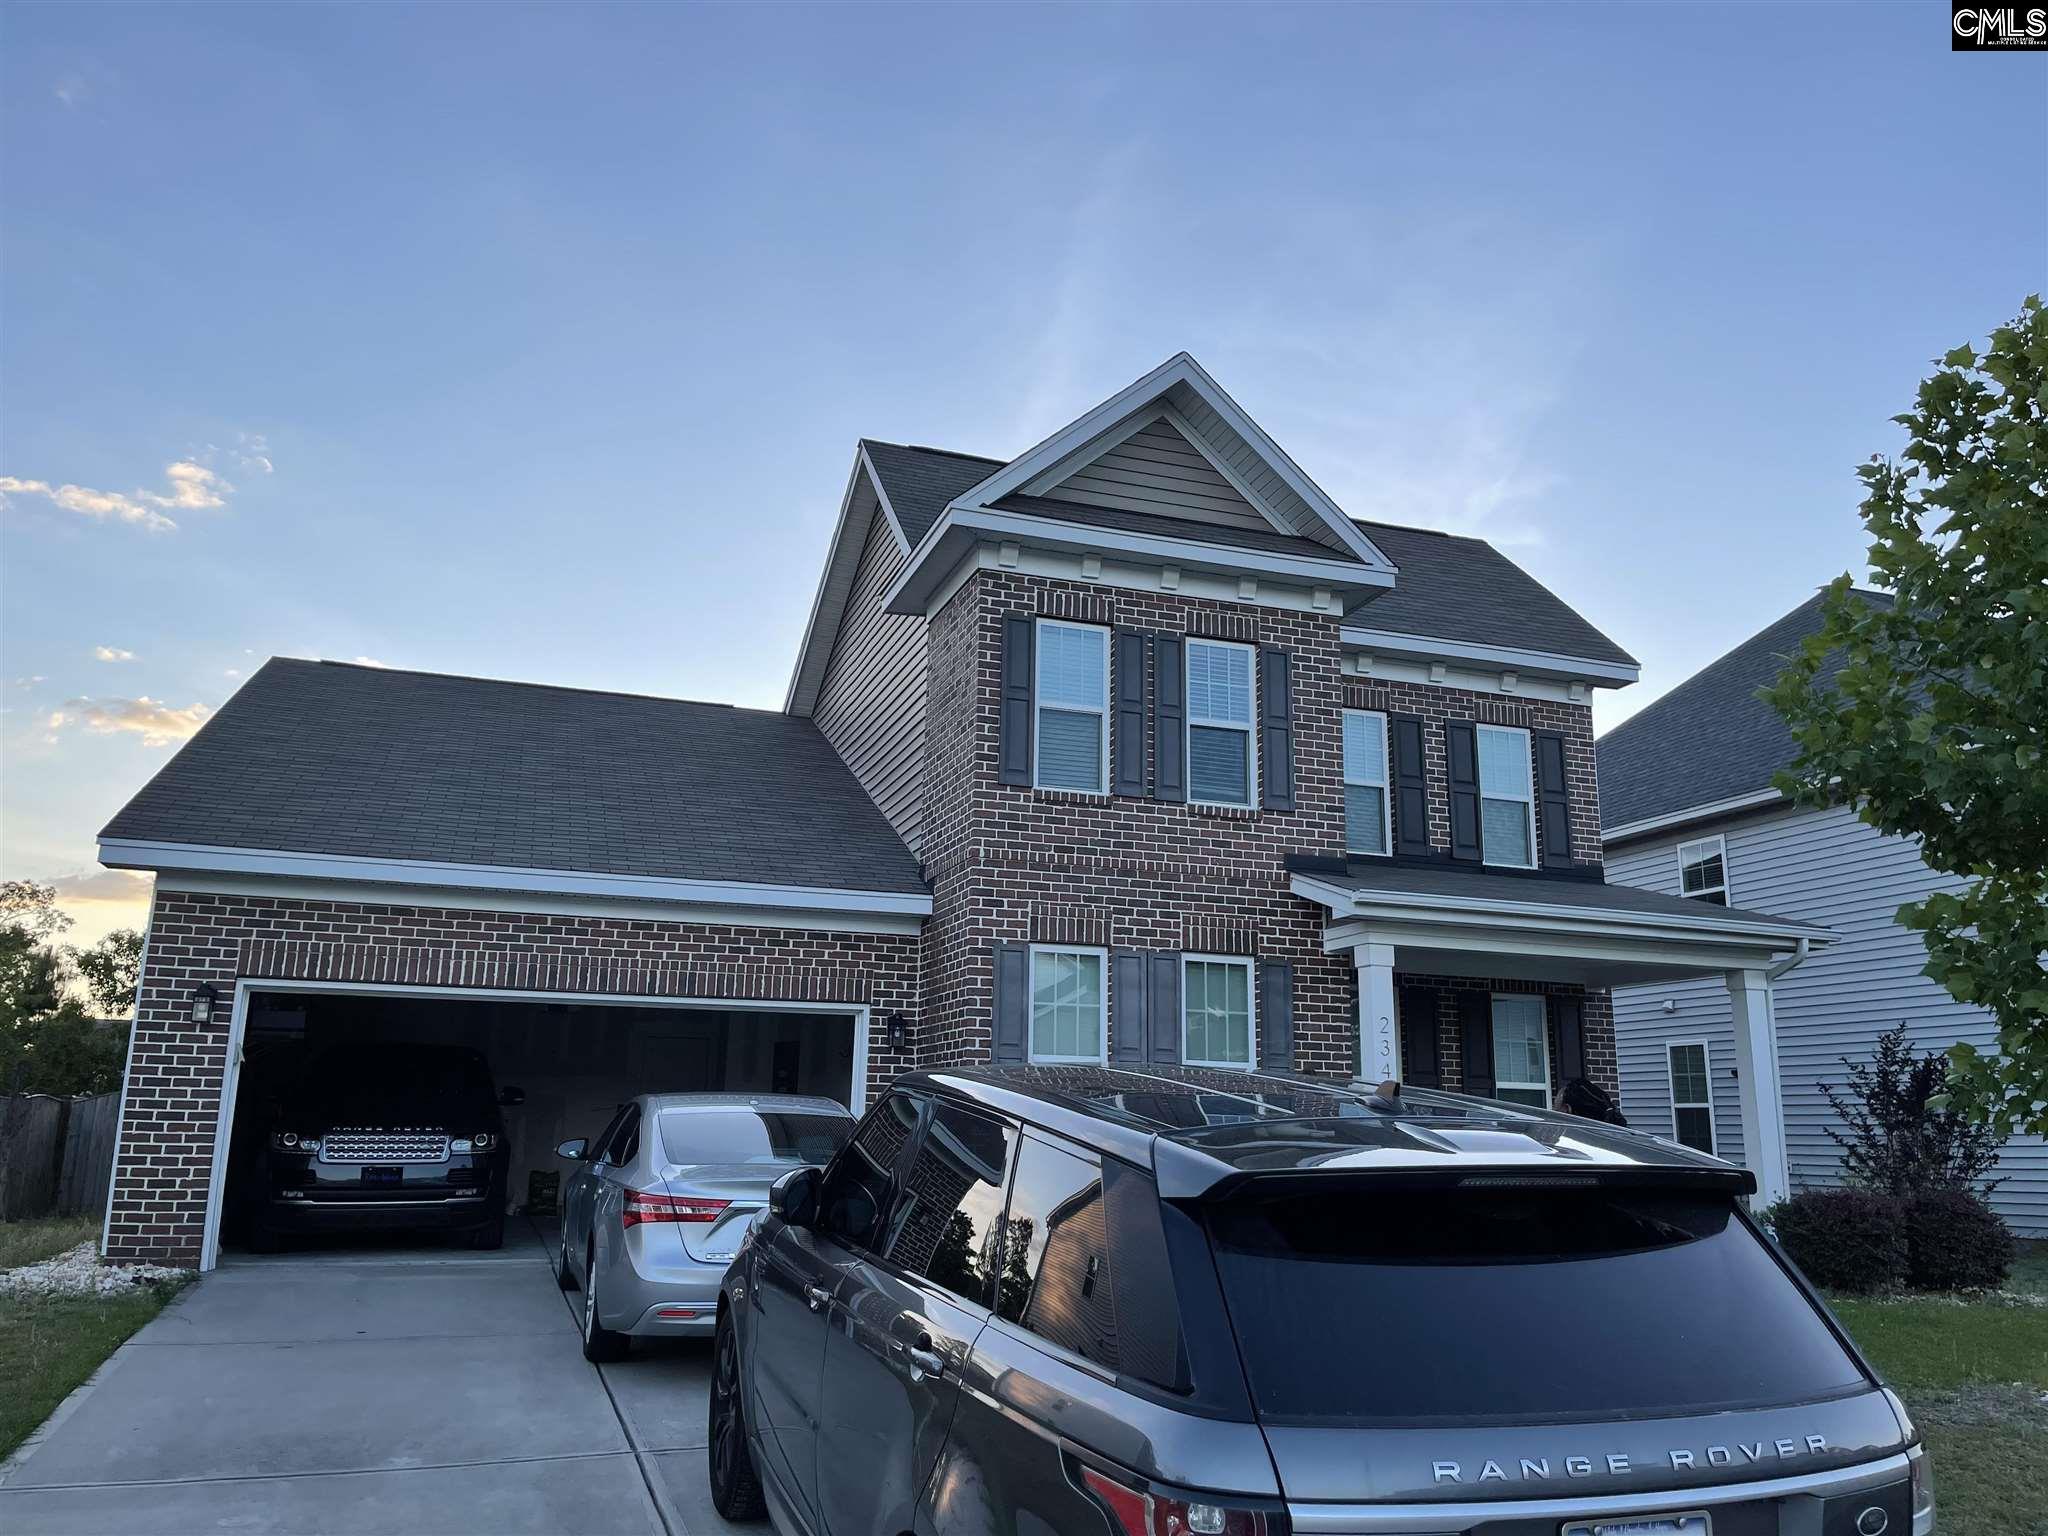 234 Charter Oaks Drive Blythewood, SC 29016-8258